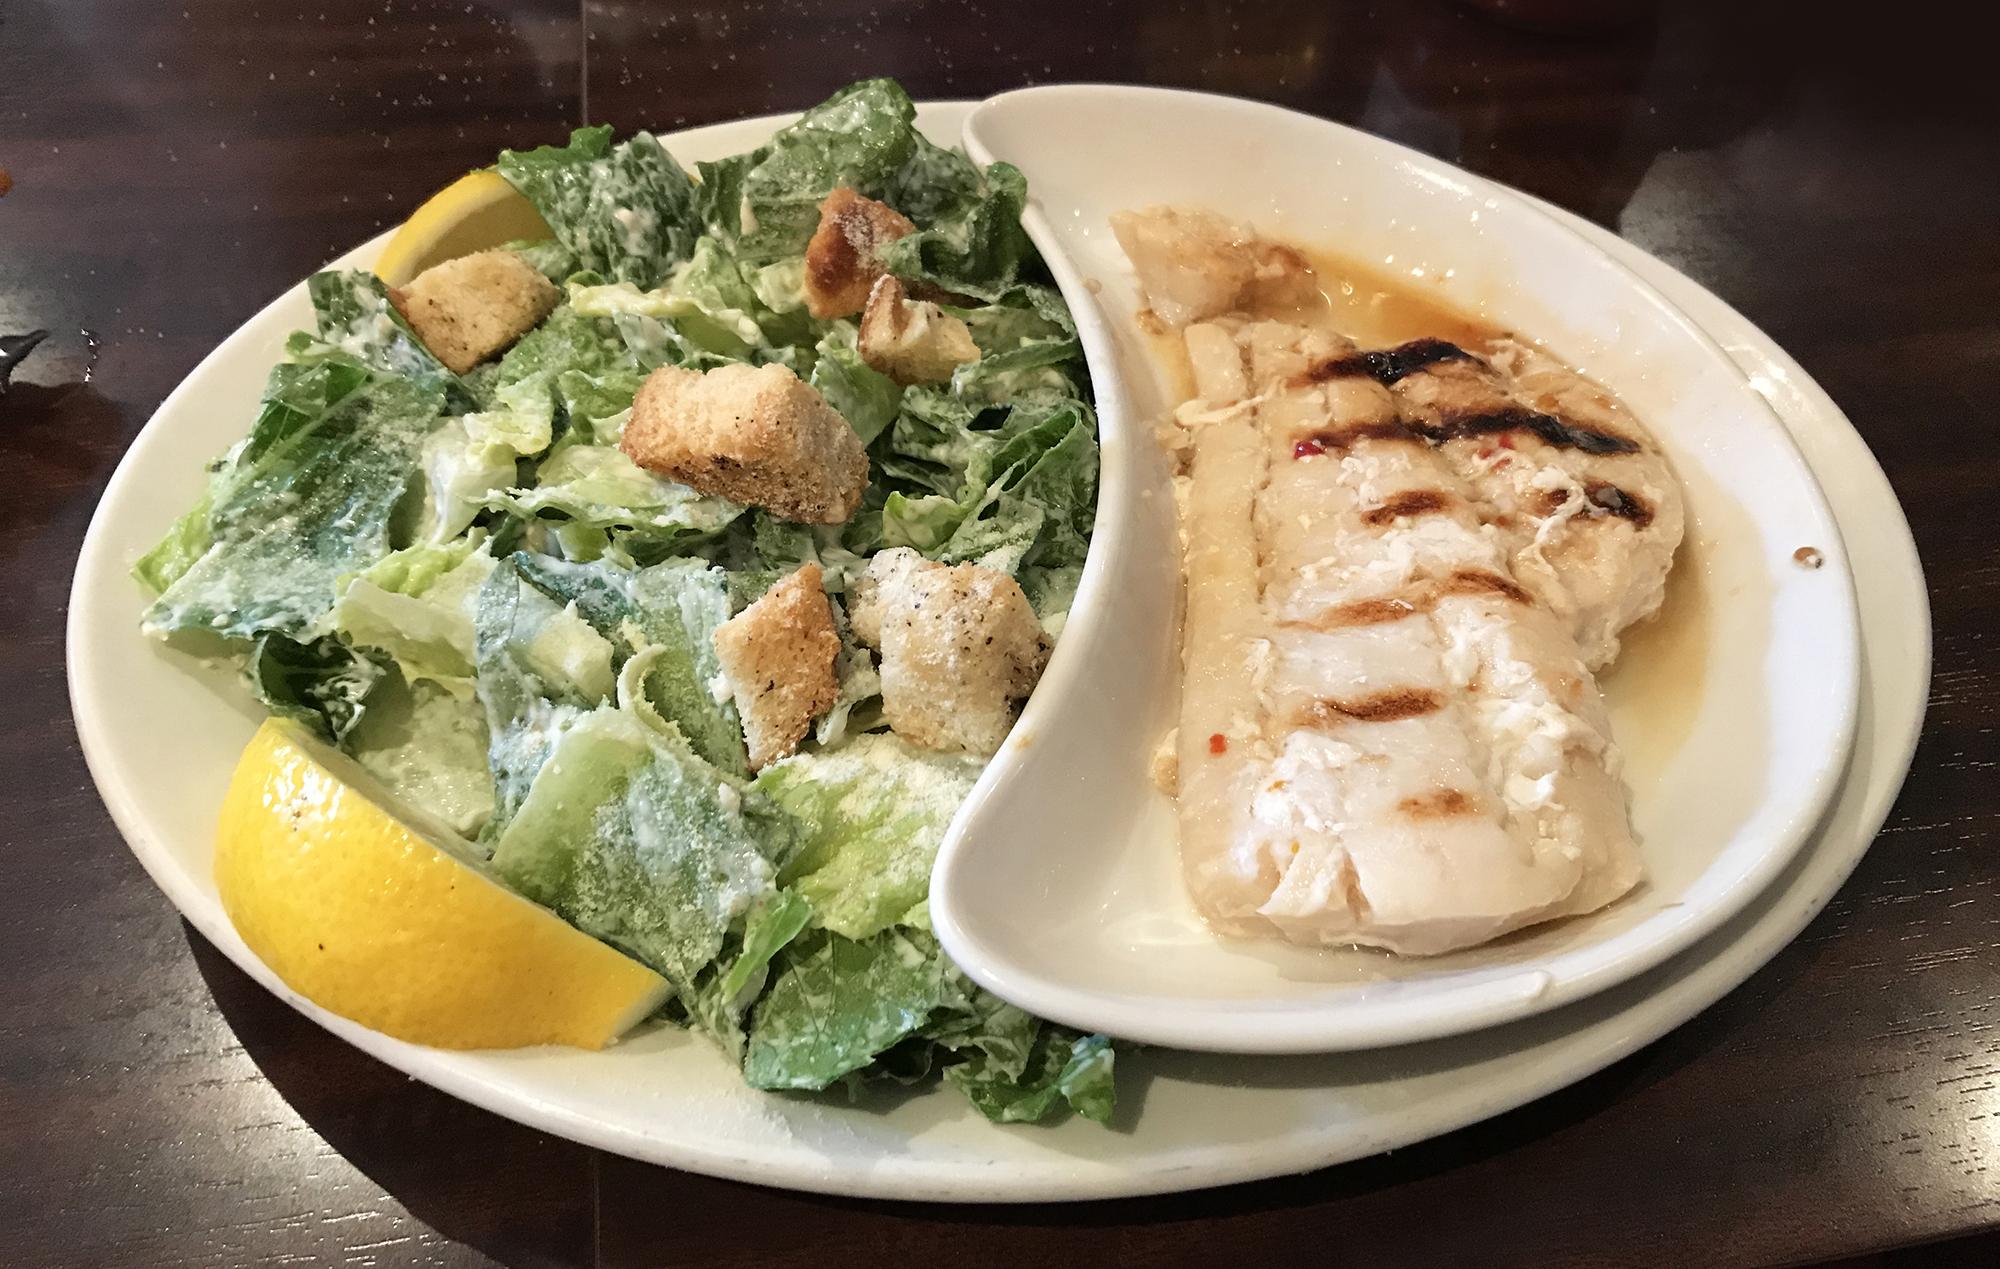 Olde Yorke Fish & Chips - Haddock Weight-Watchers